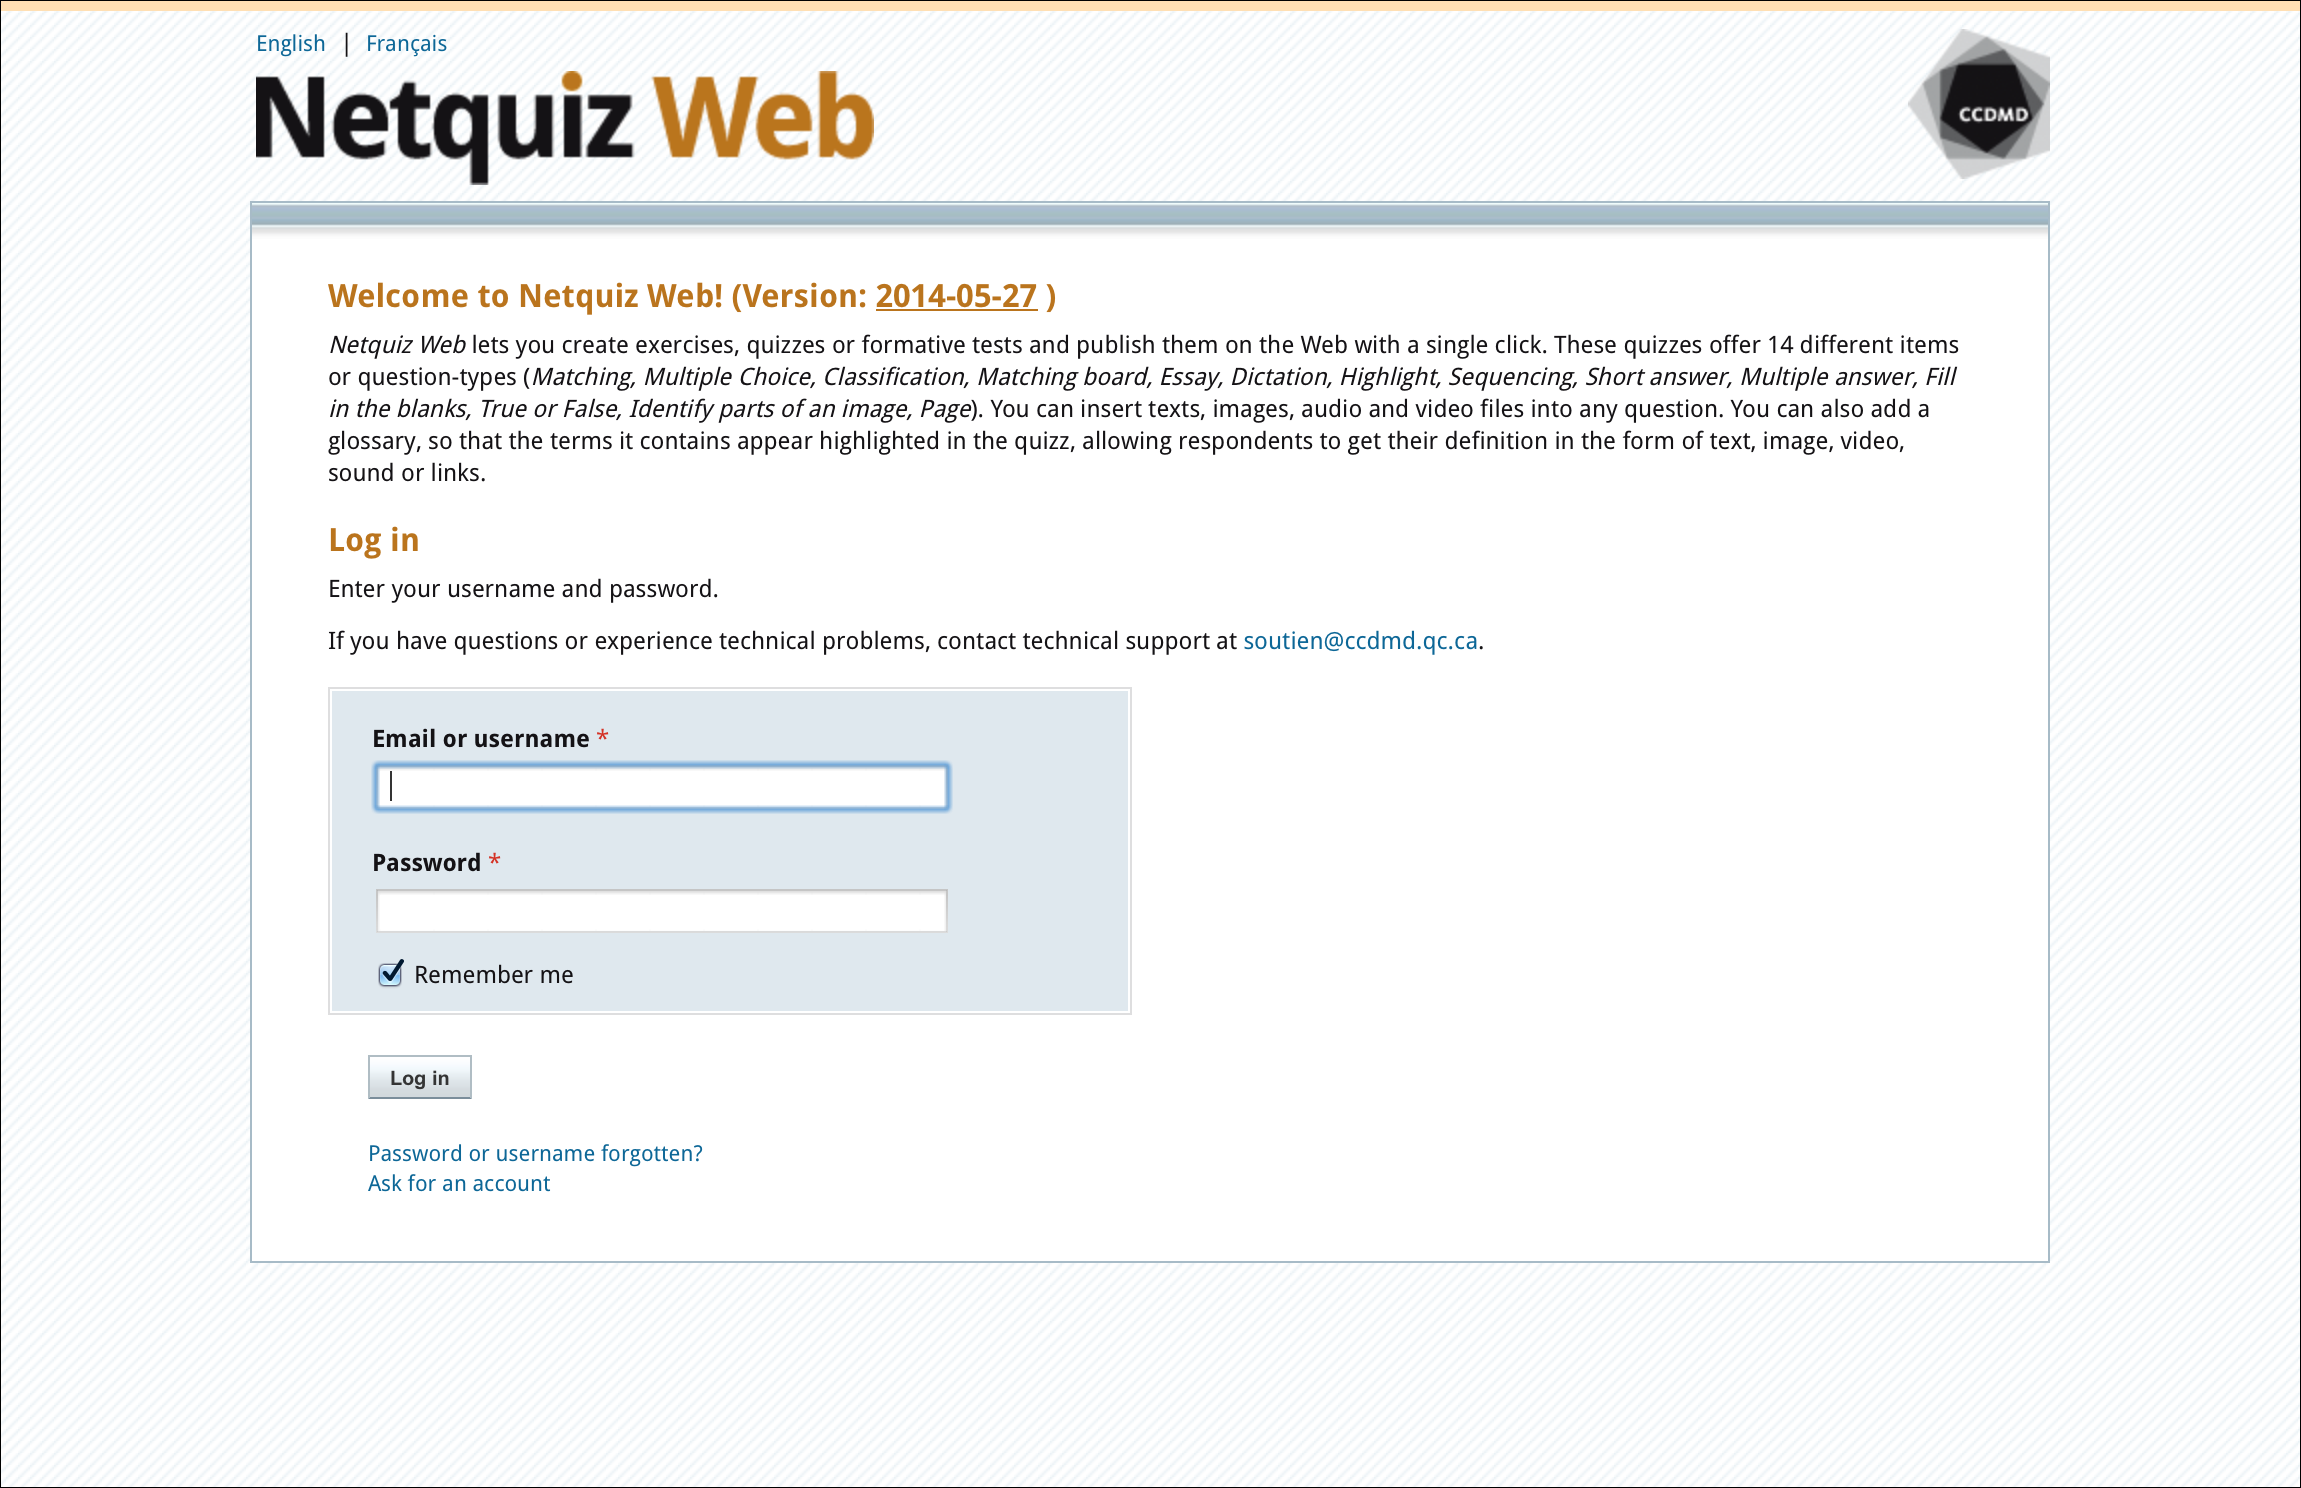 Netquiz Web